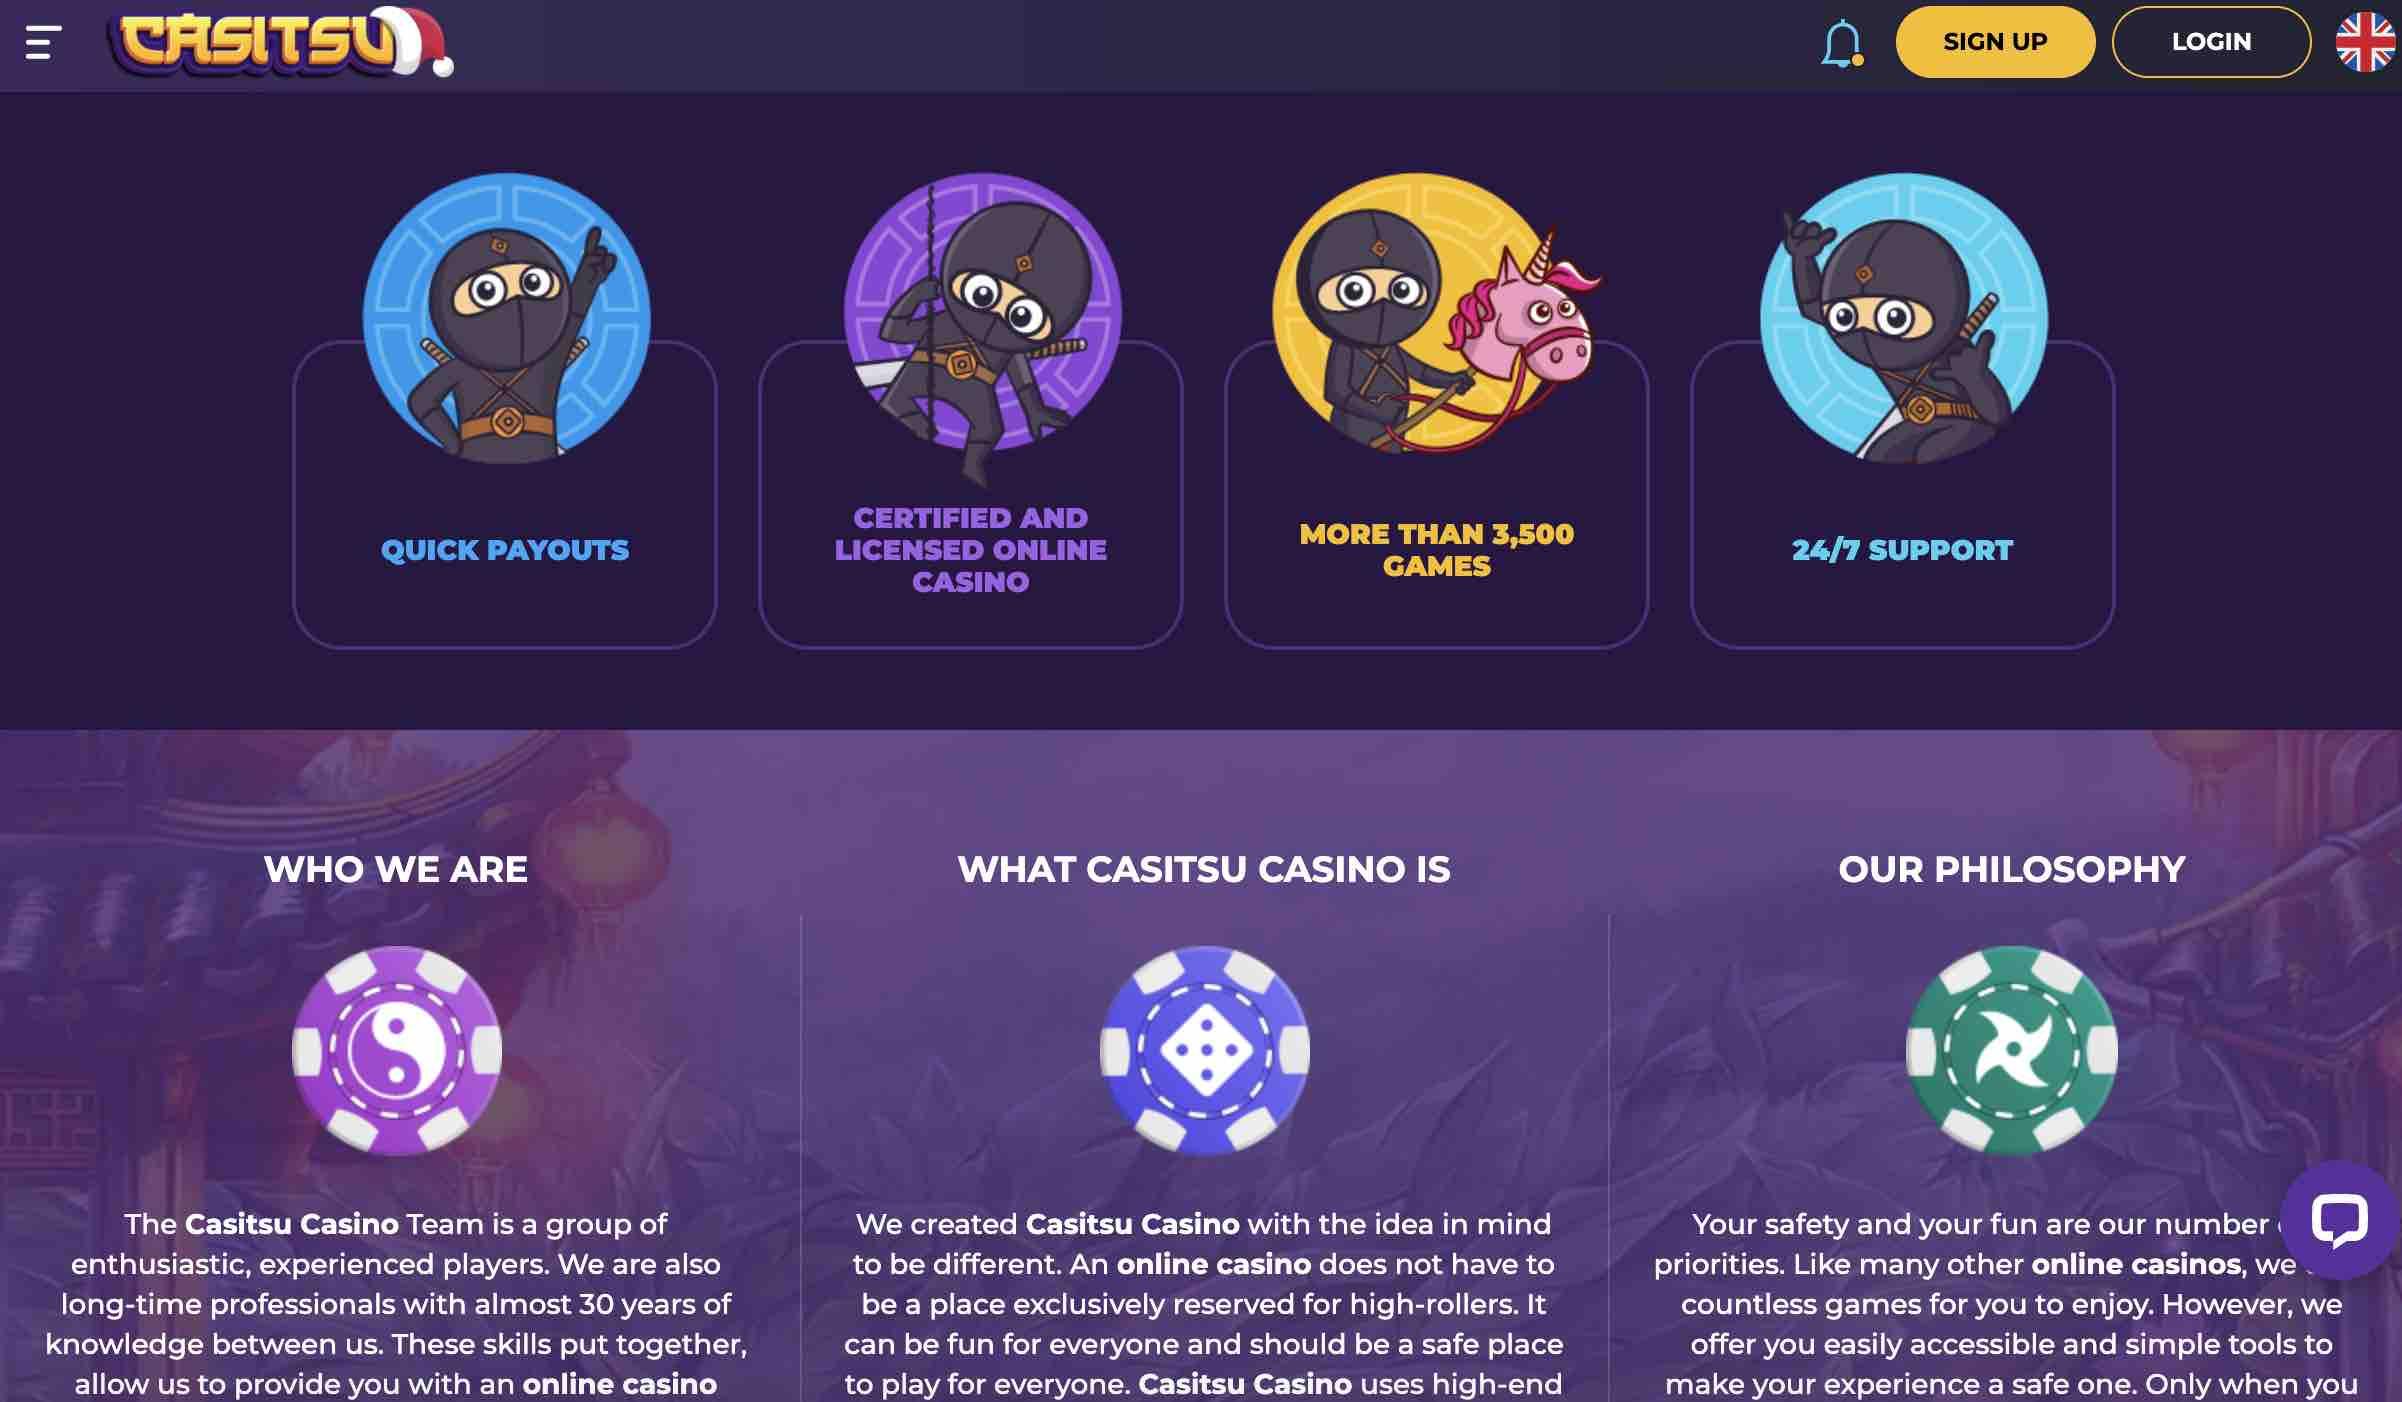 Great Games at Casitsu Casino